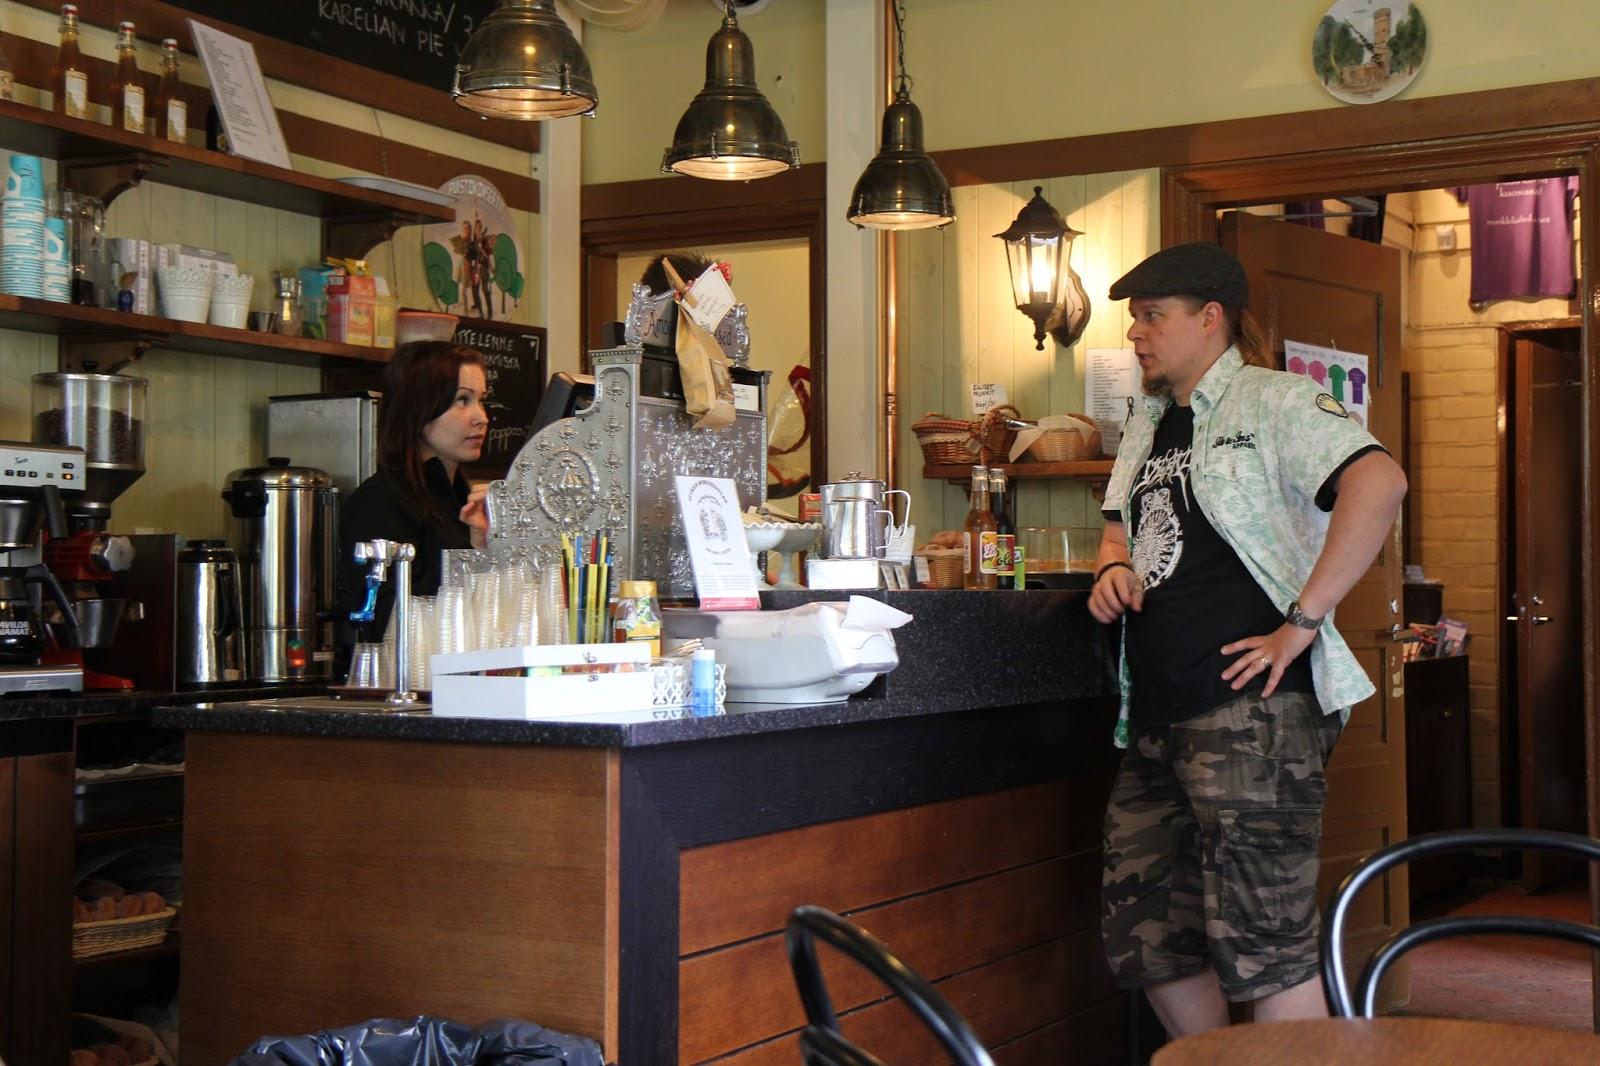 munkkeja ja kahvia dating Blogit dating suhteet